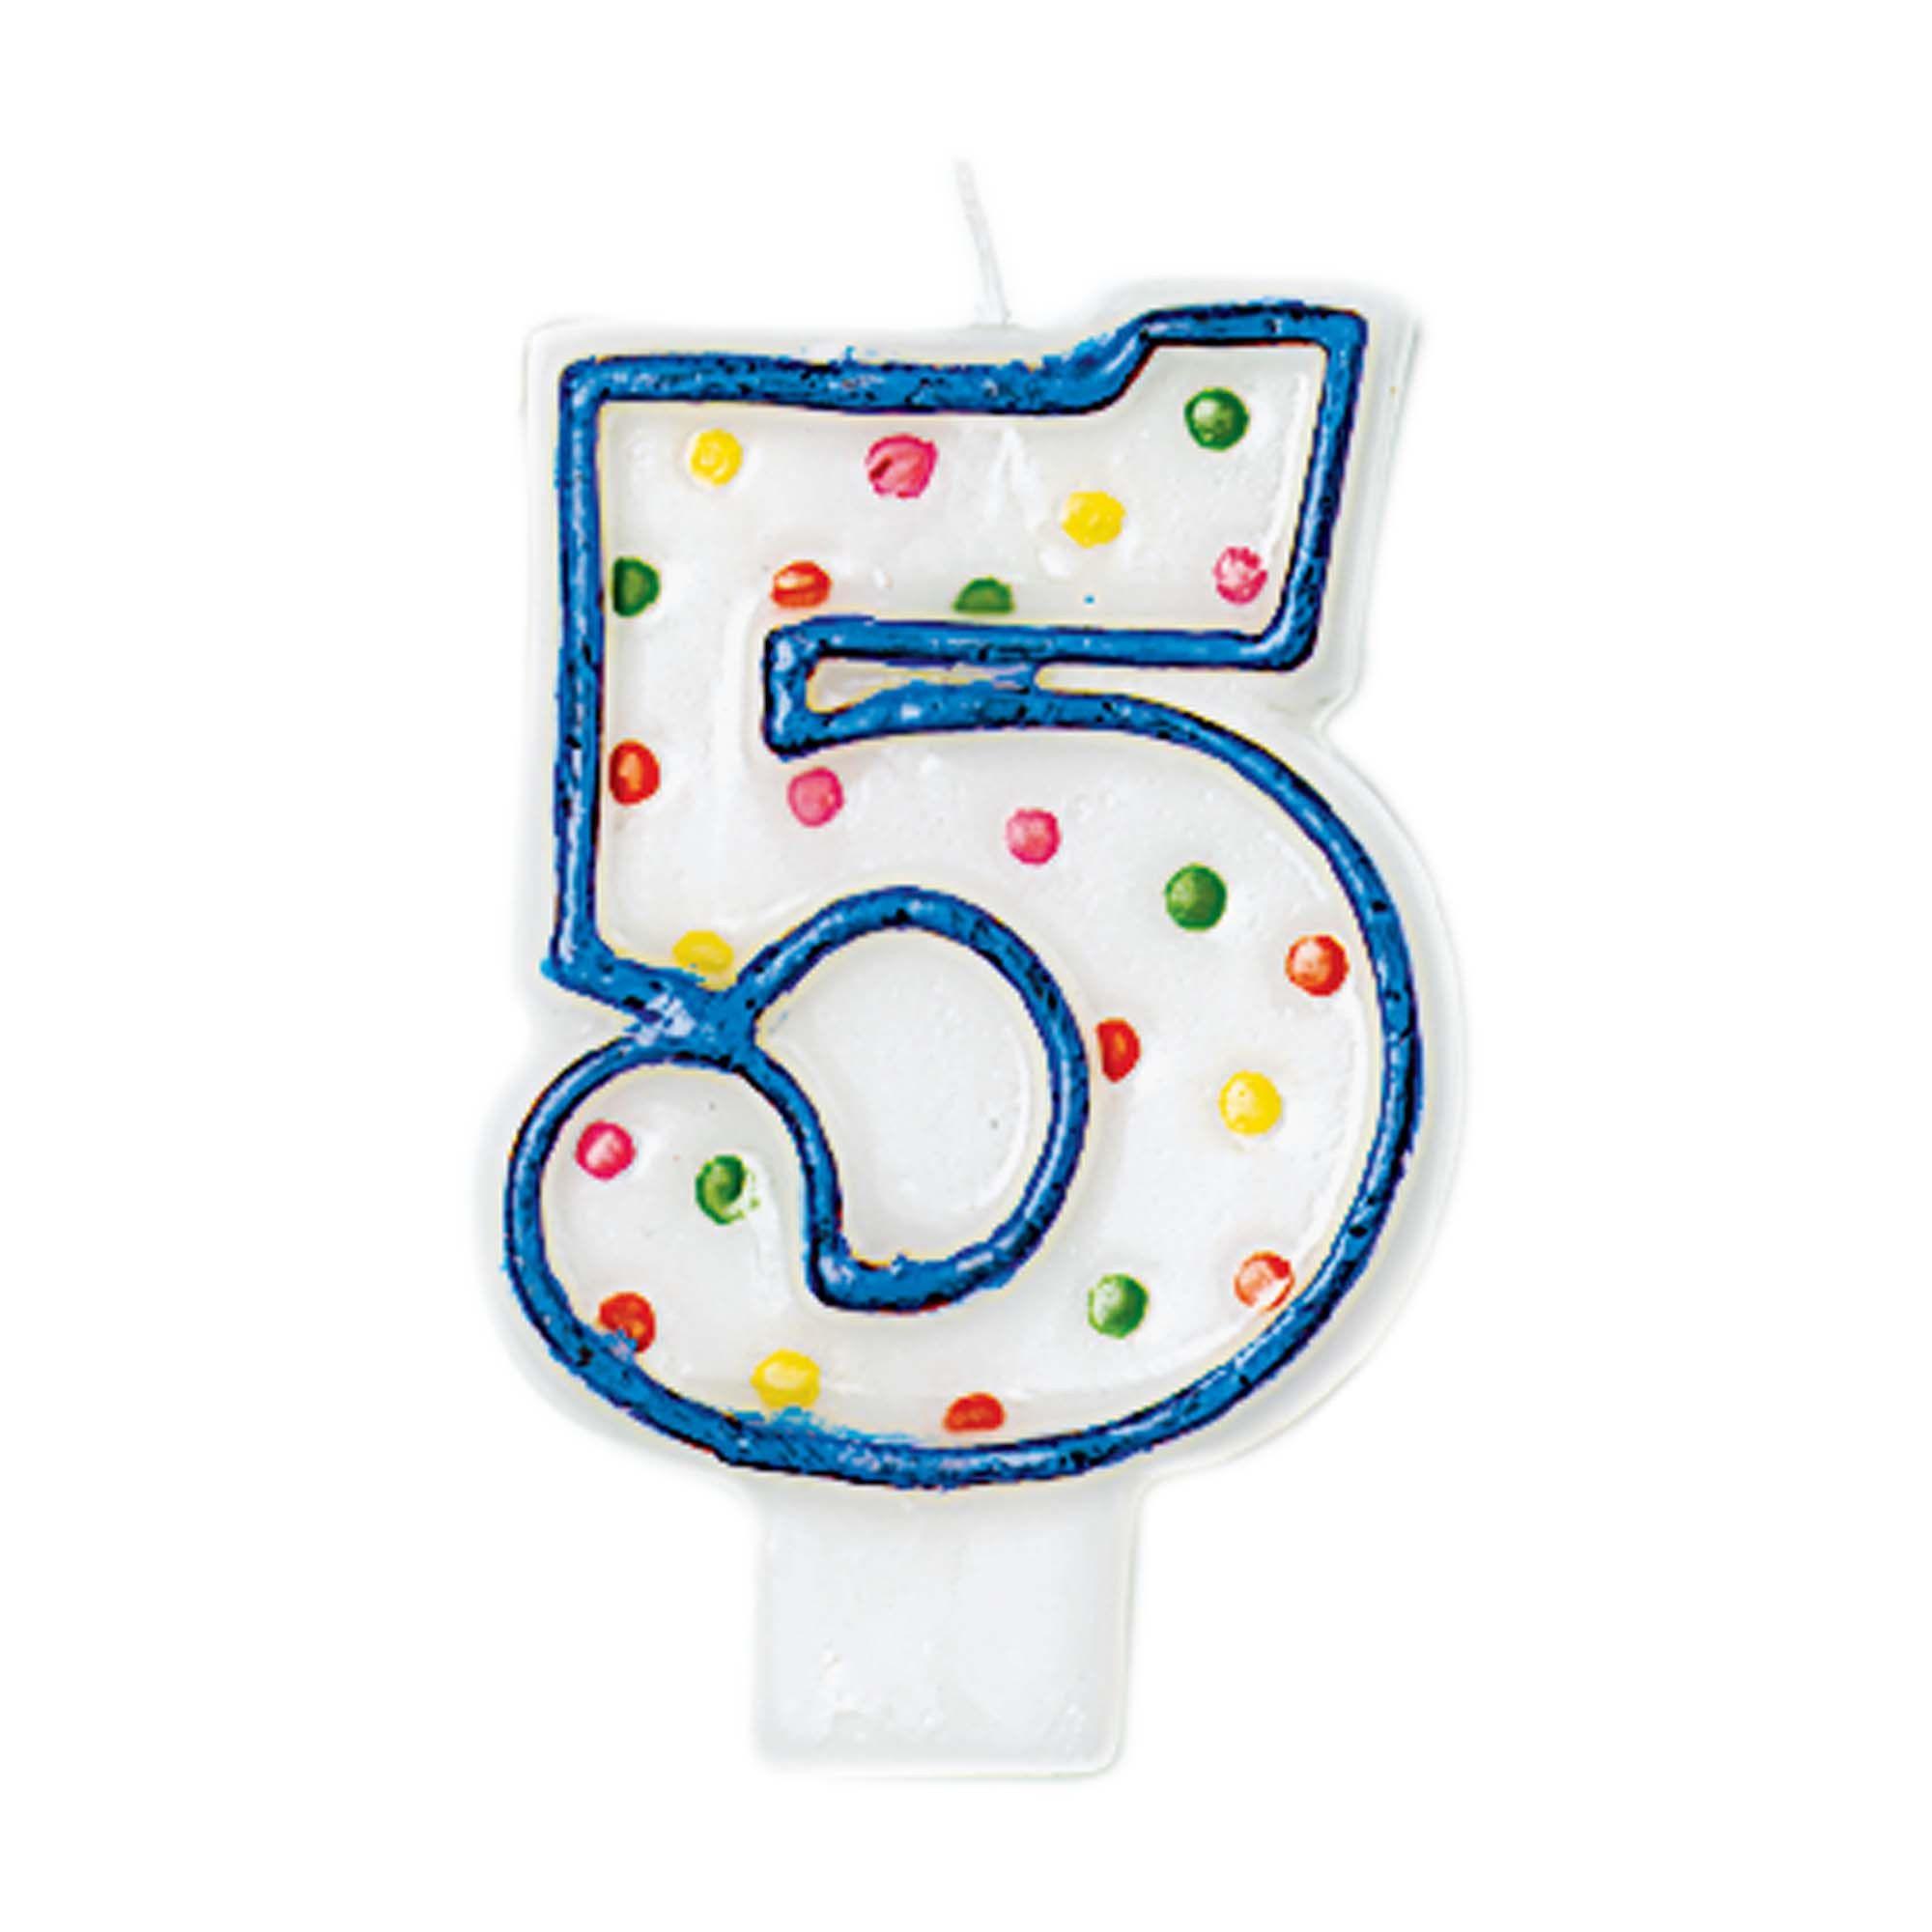 #5 Polka Dot Candle